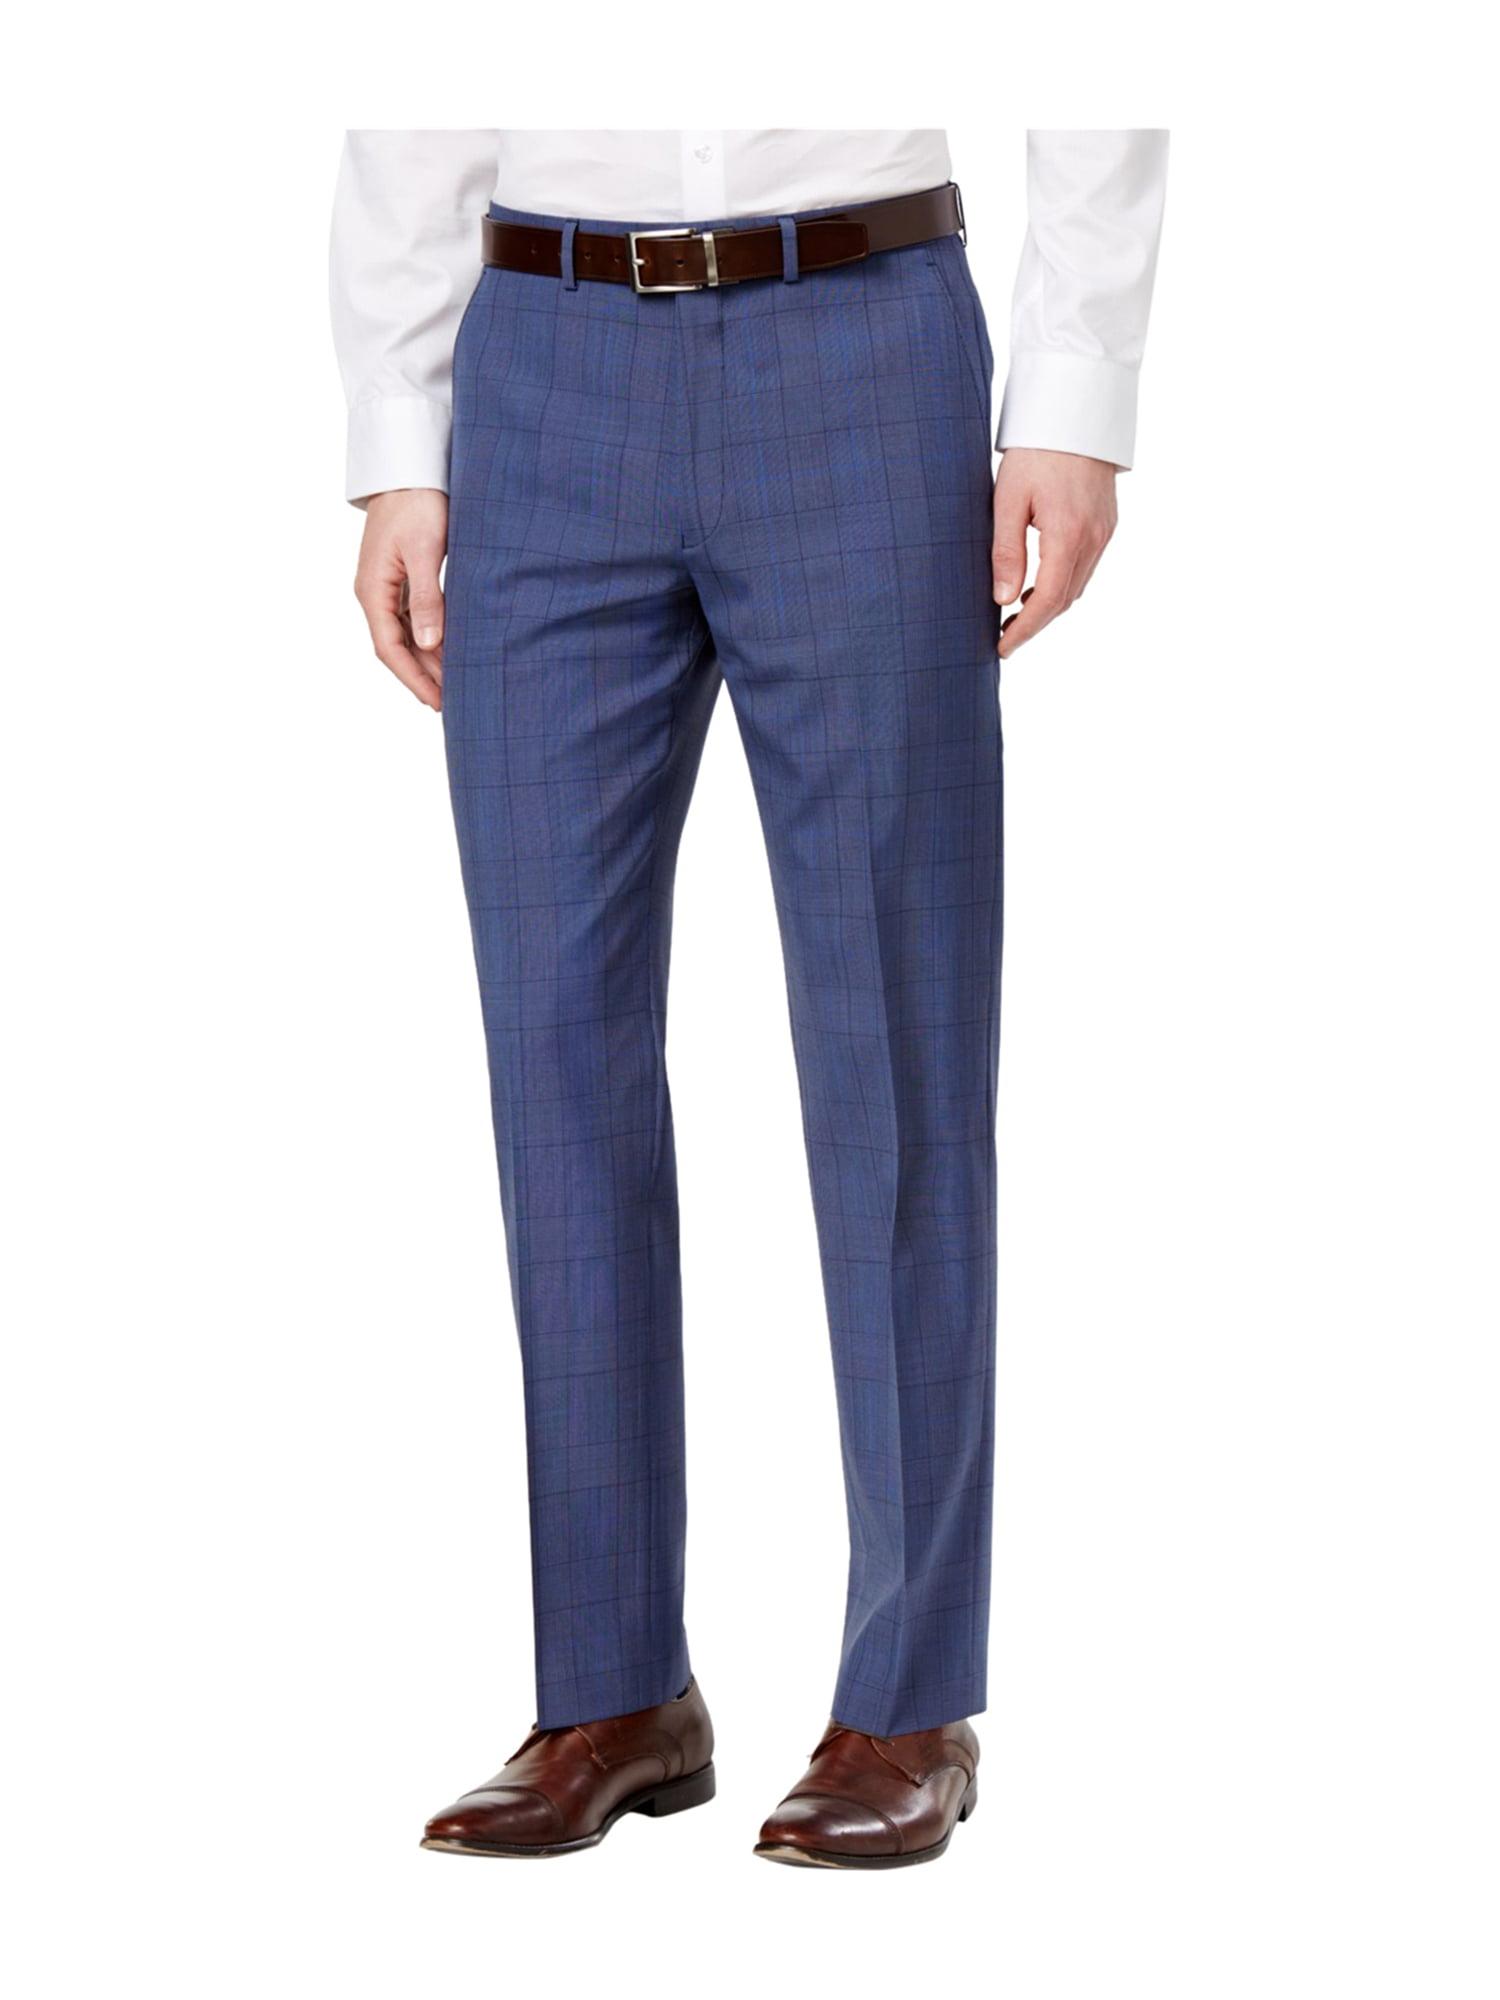 Ryan Seacrest Distinction Mens Herringbone Dress Pant Slacks